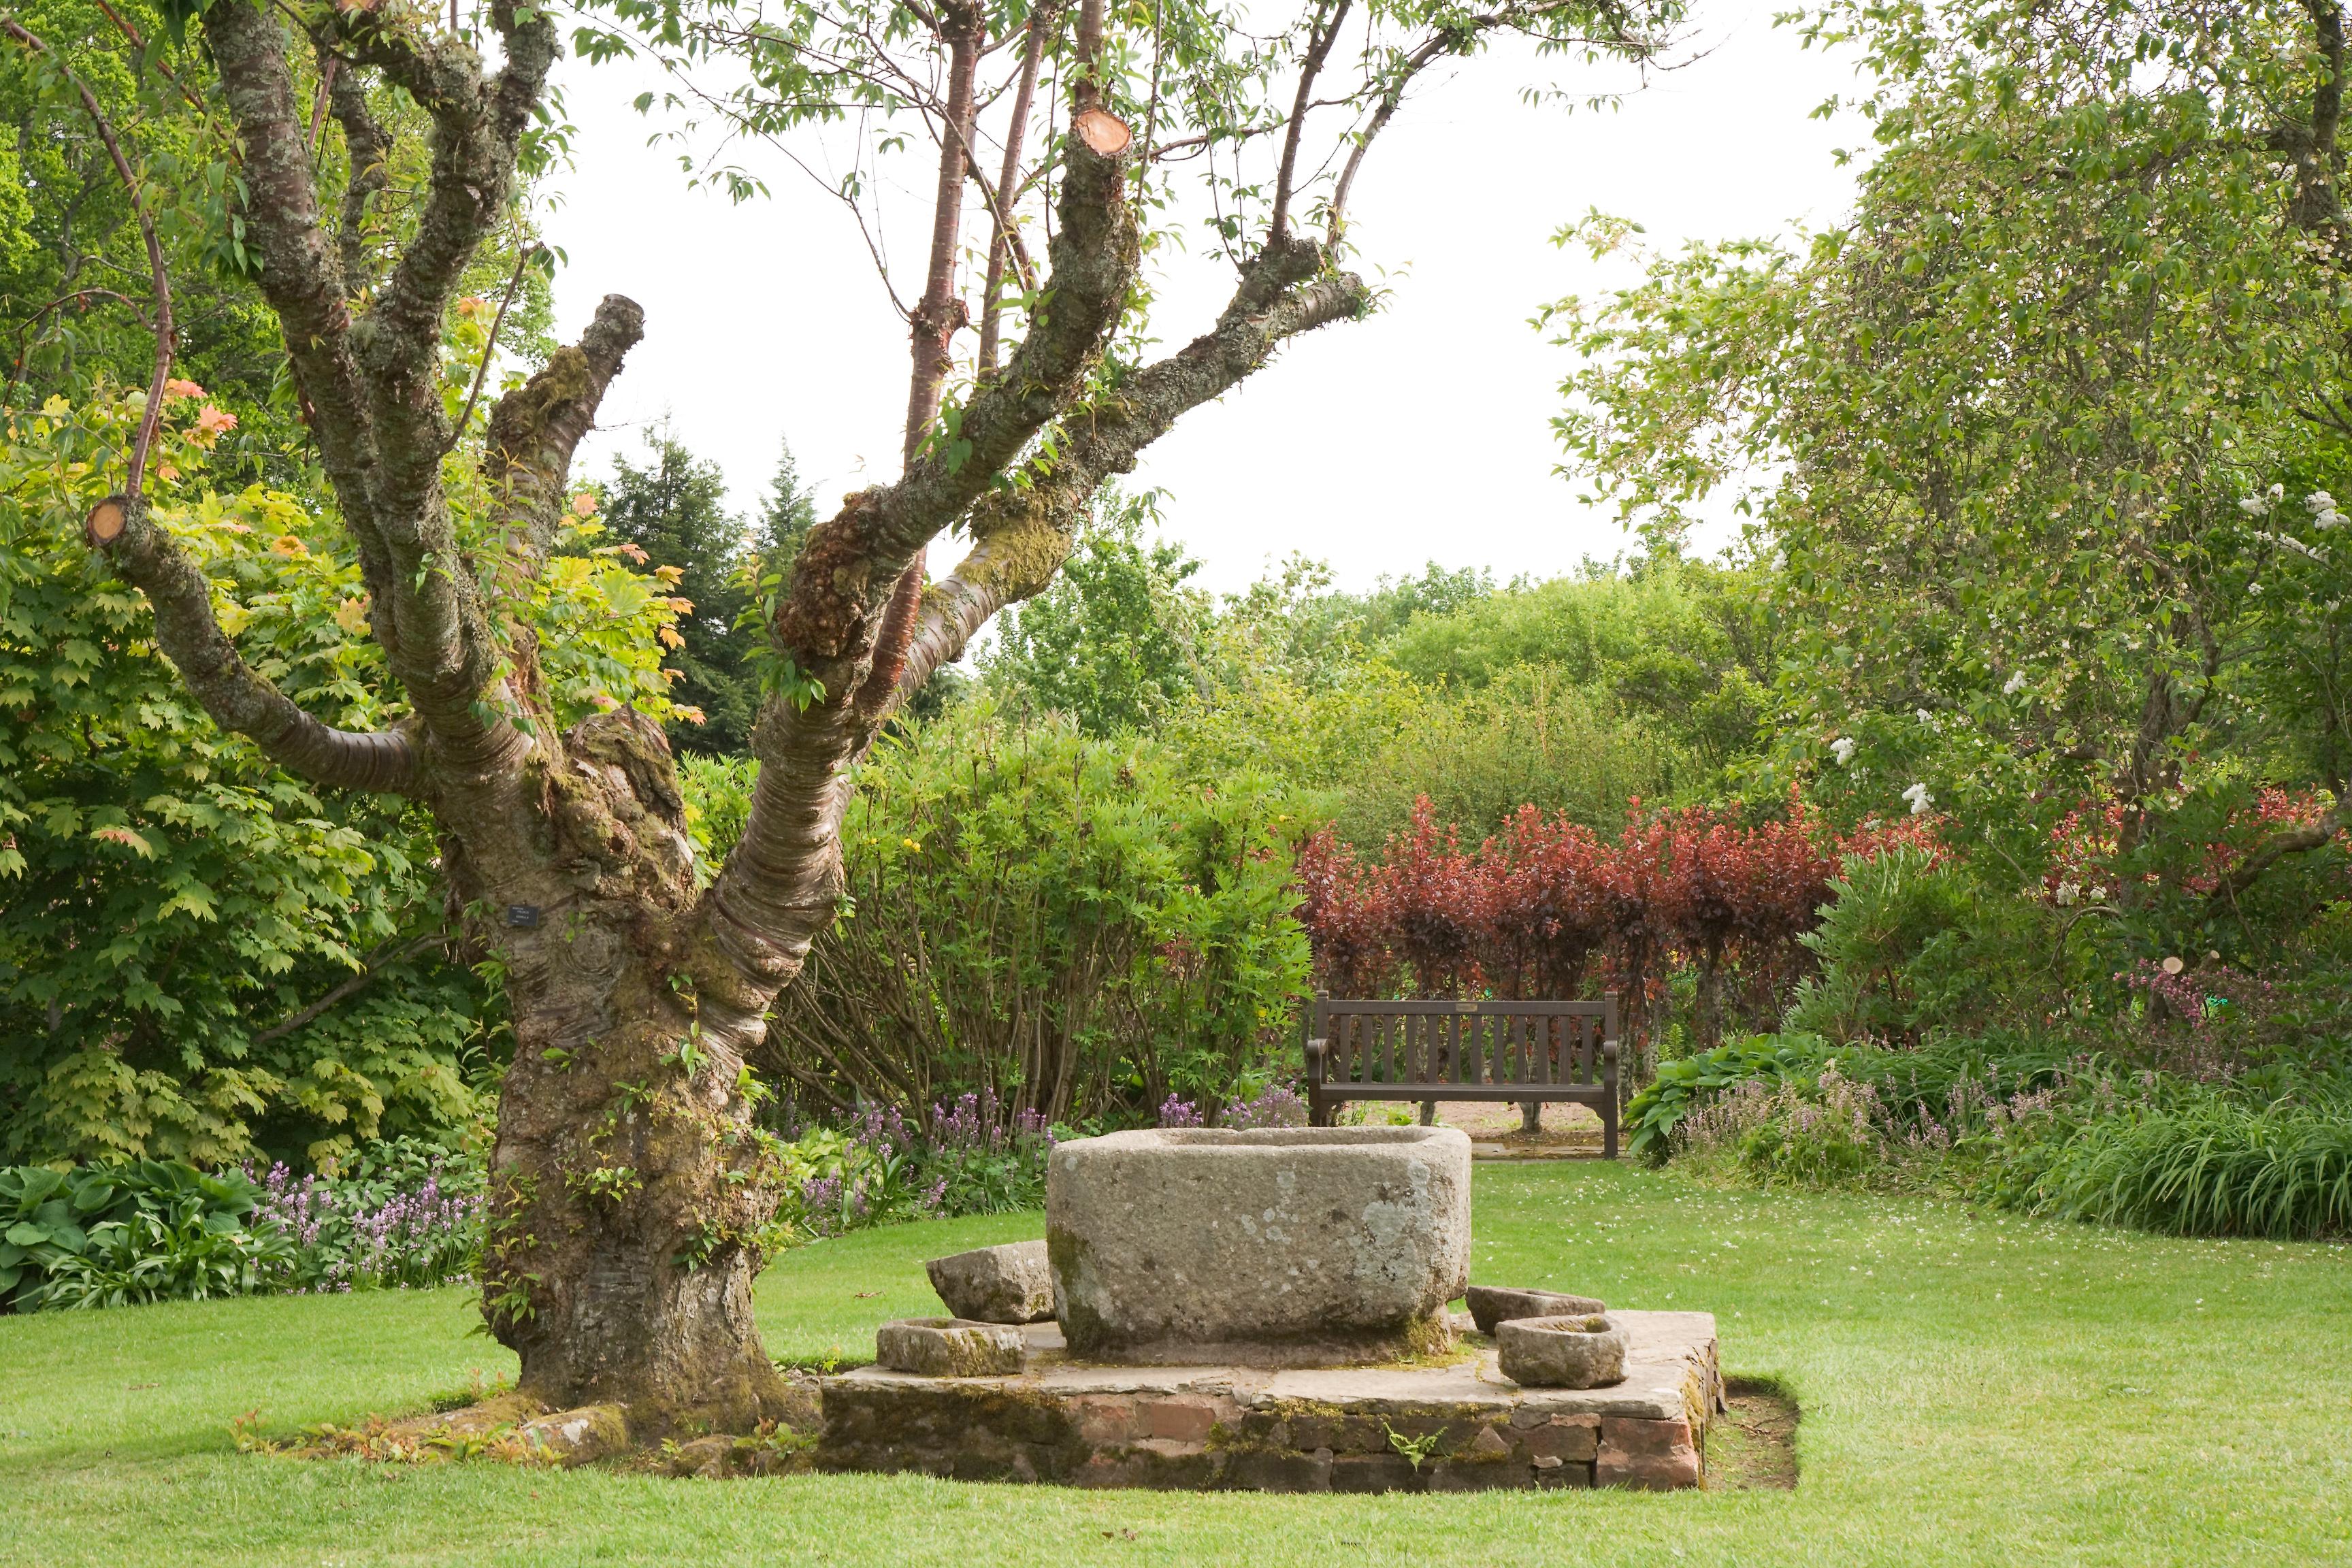 File:Crathes Castle garden tree.jpg - Wikimedia Commons